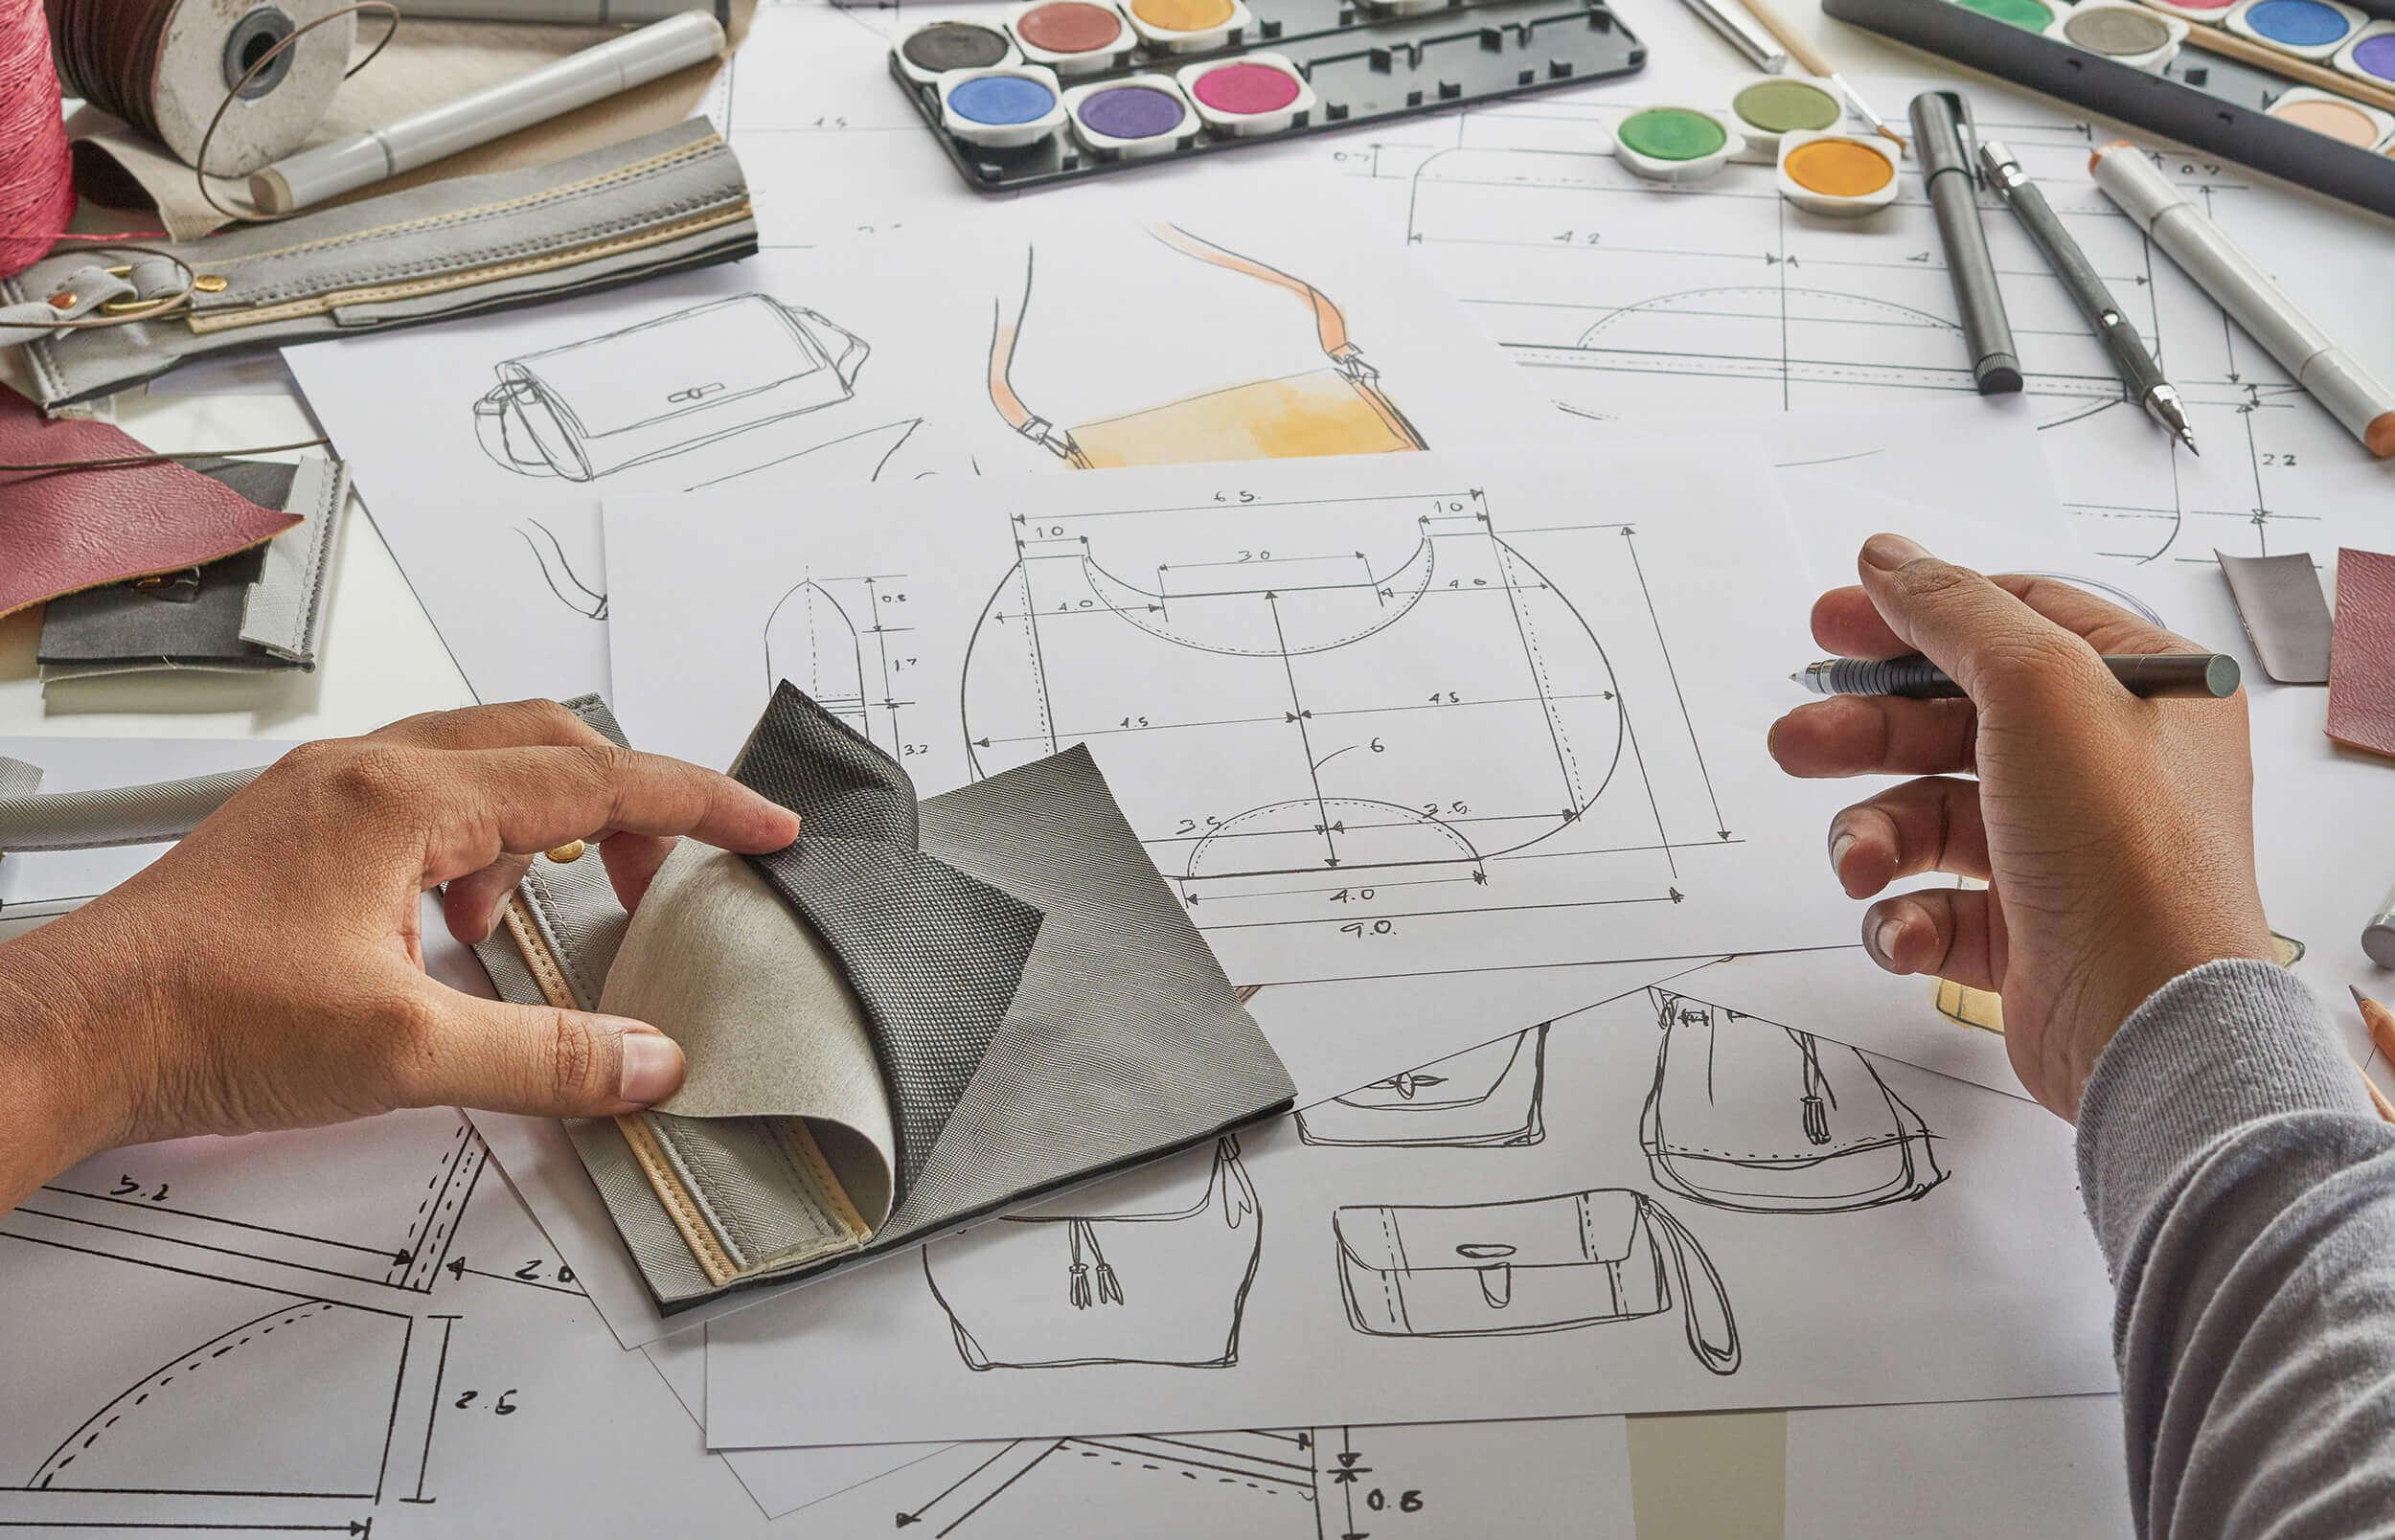 Handbag Designer Sketching Technical Drawings